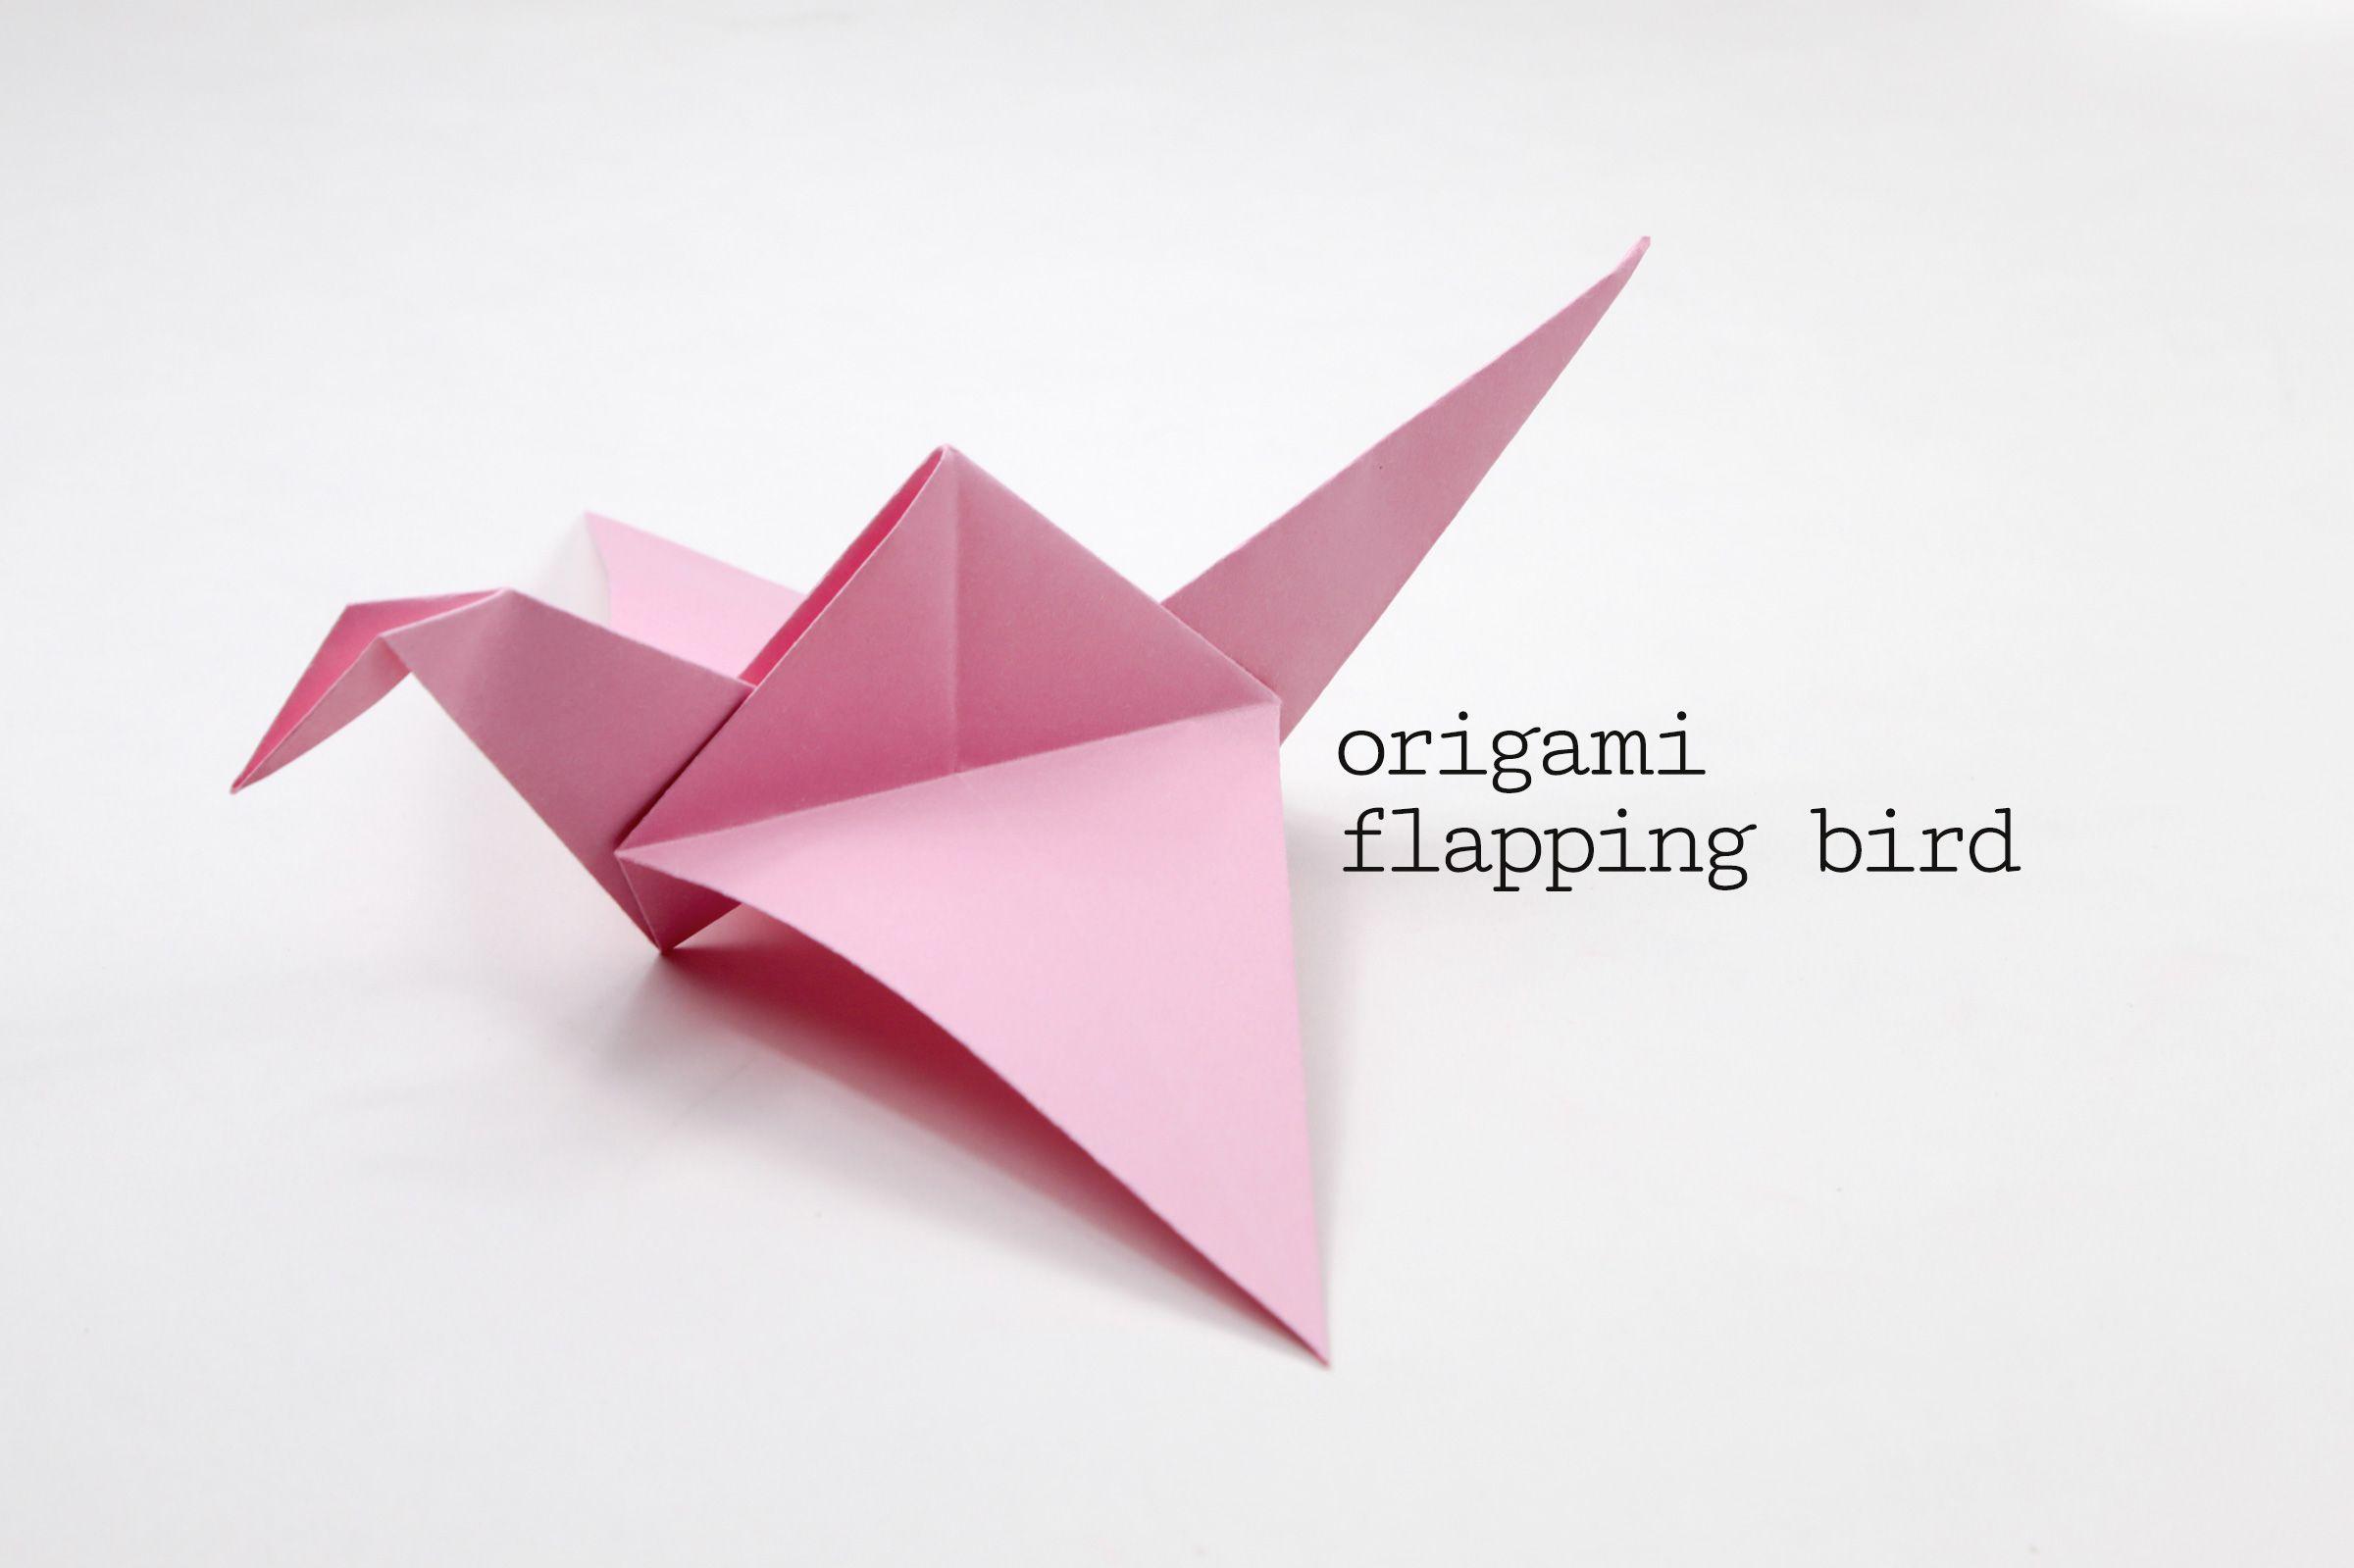 flapping bird diagram | Origami swan, Flapping bird, Origami crane | 1599x2400